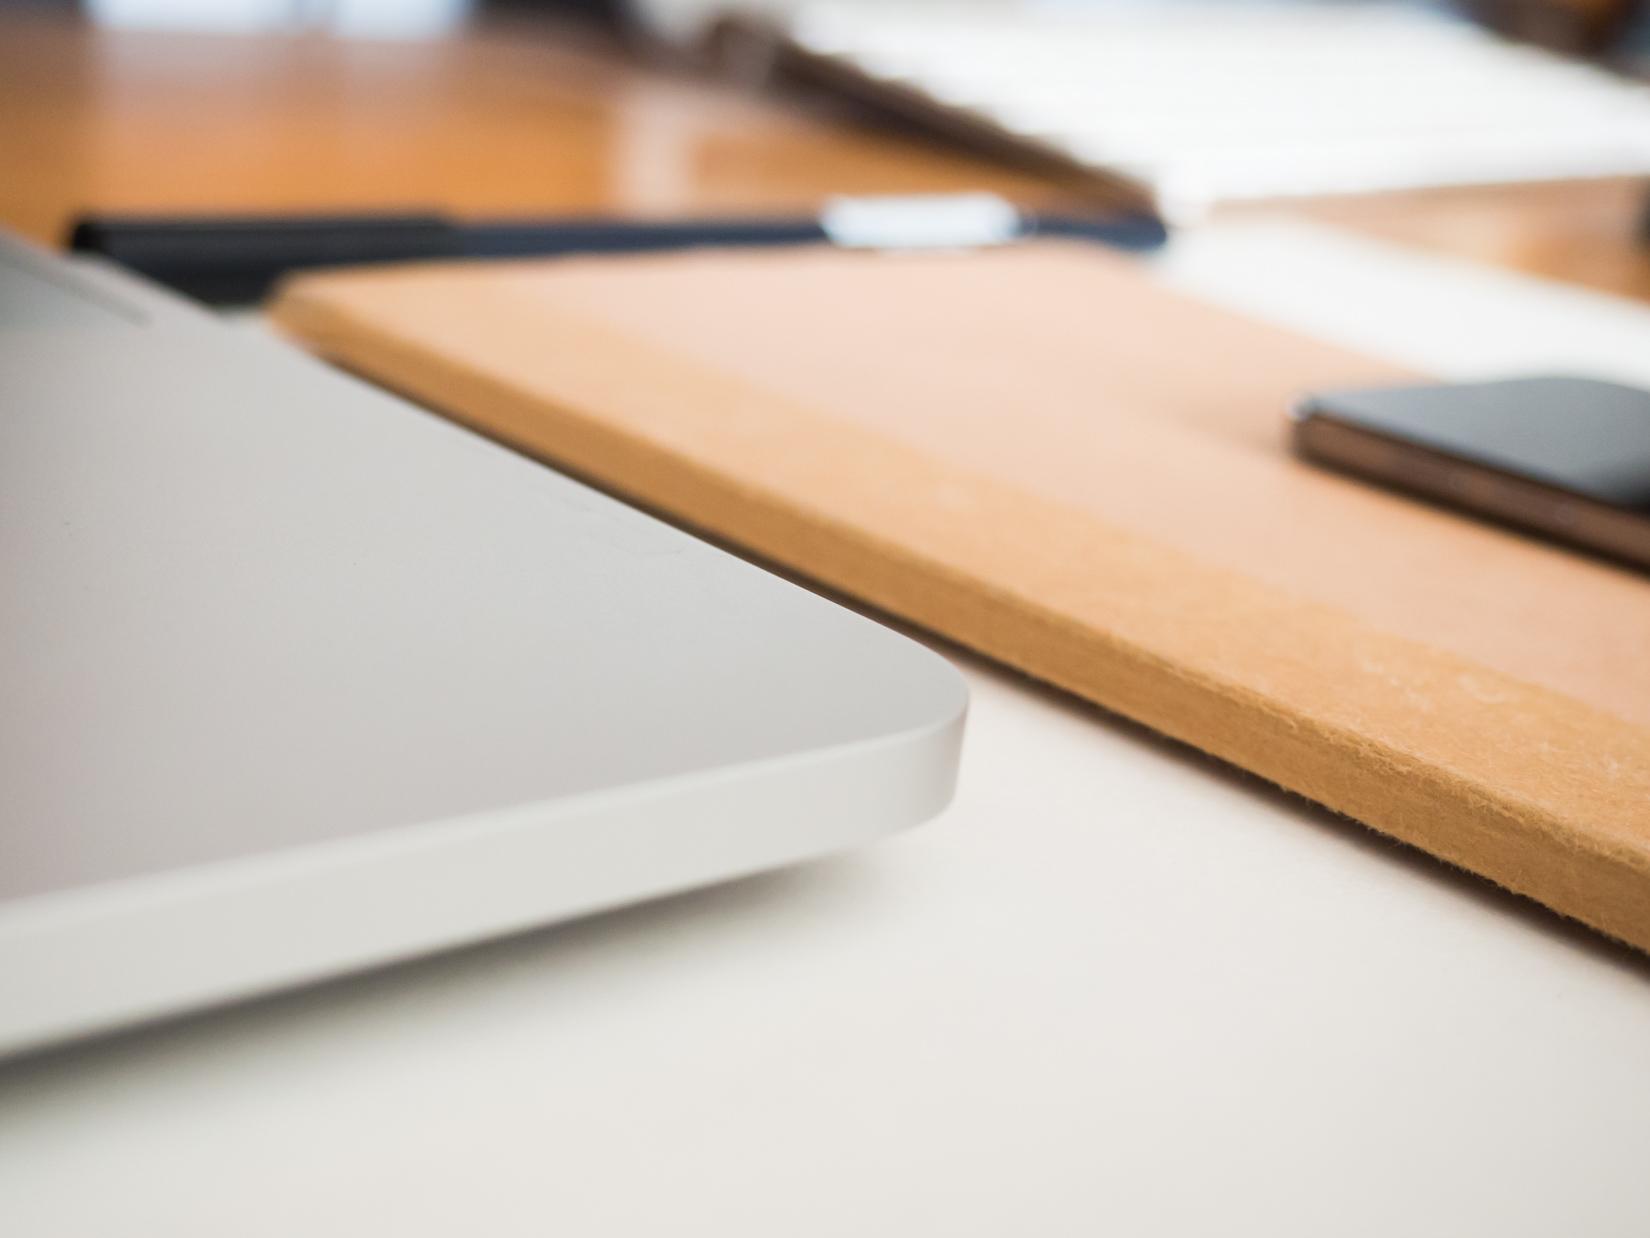 Desk with Sketchbook and Laptop